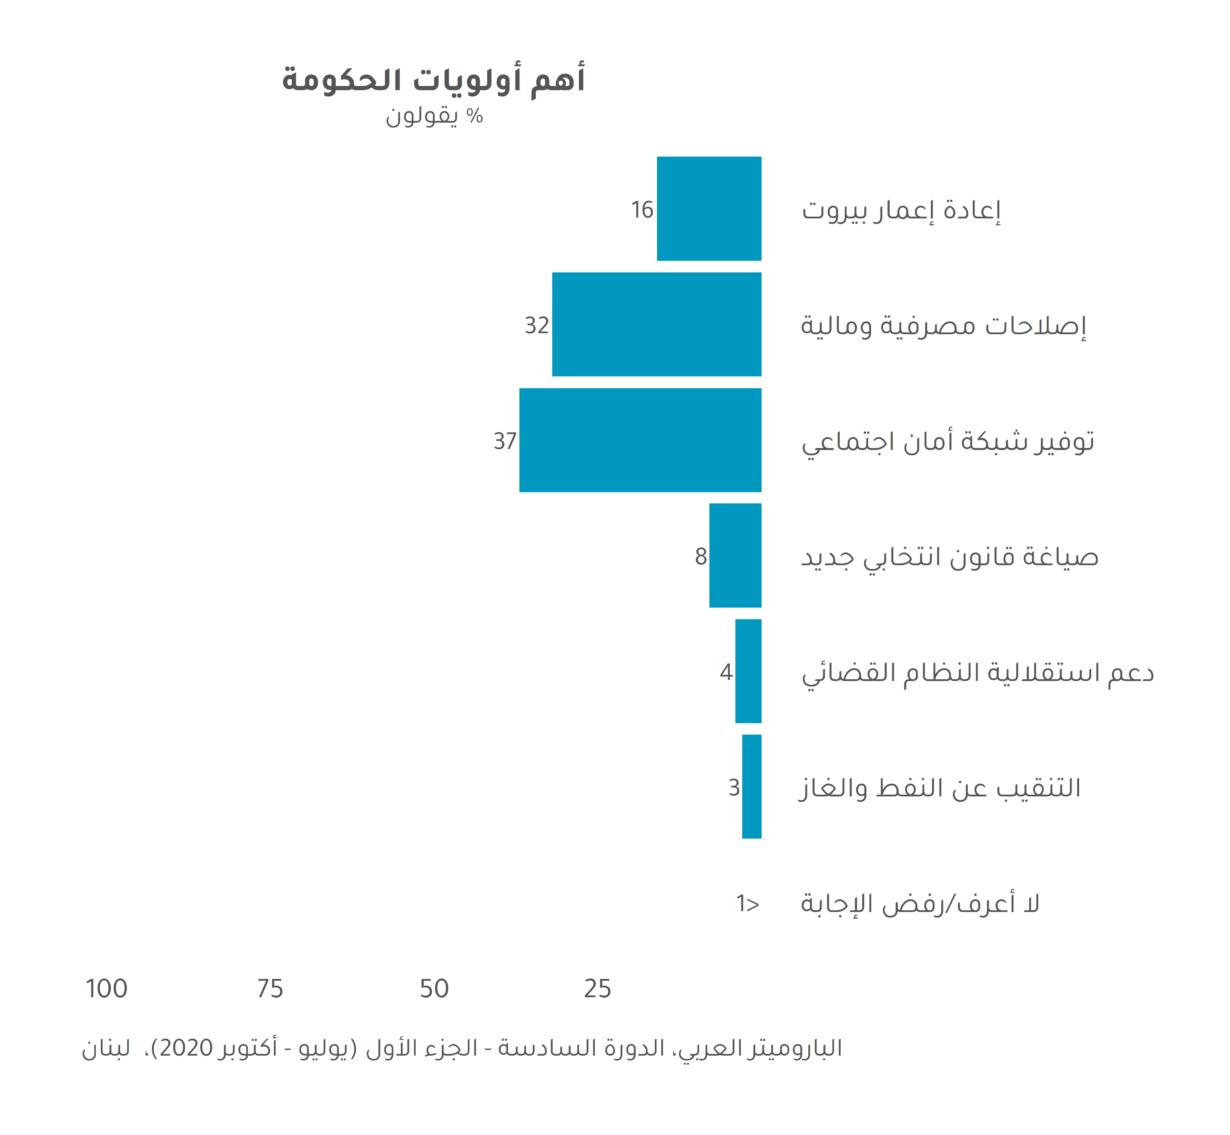 قياس نبض لبنان بعد انفجار بيروت